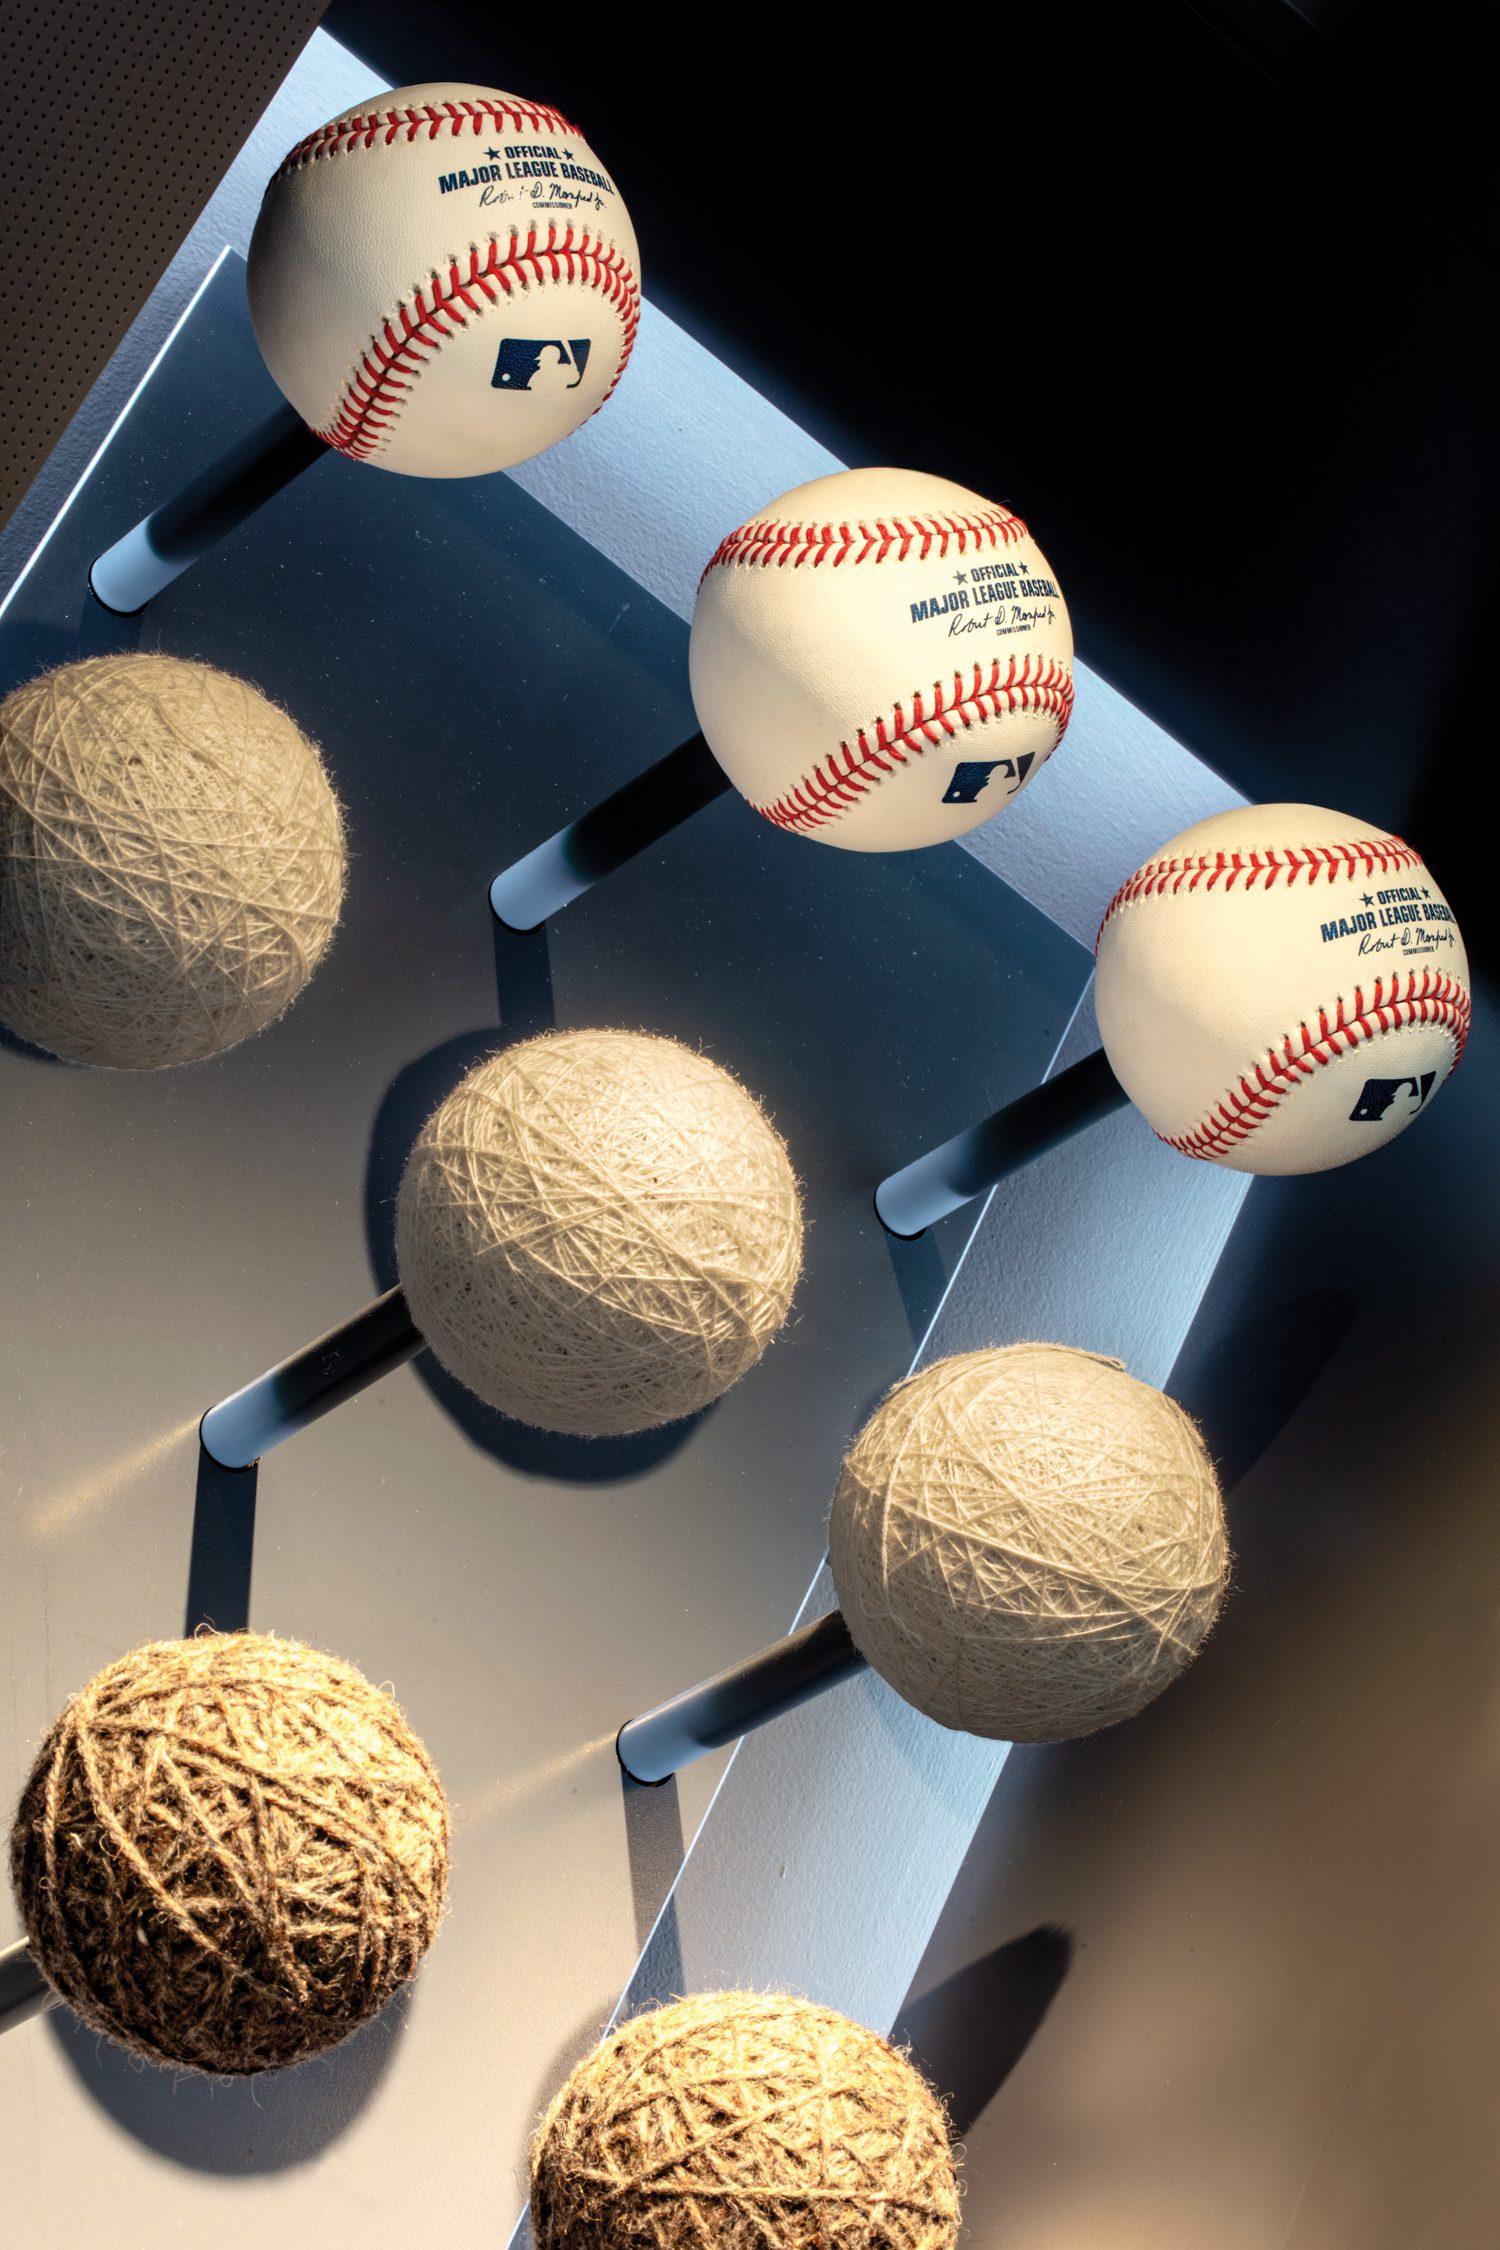 Deconstructed baseballs.